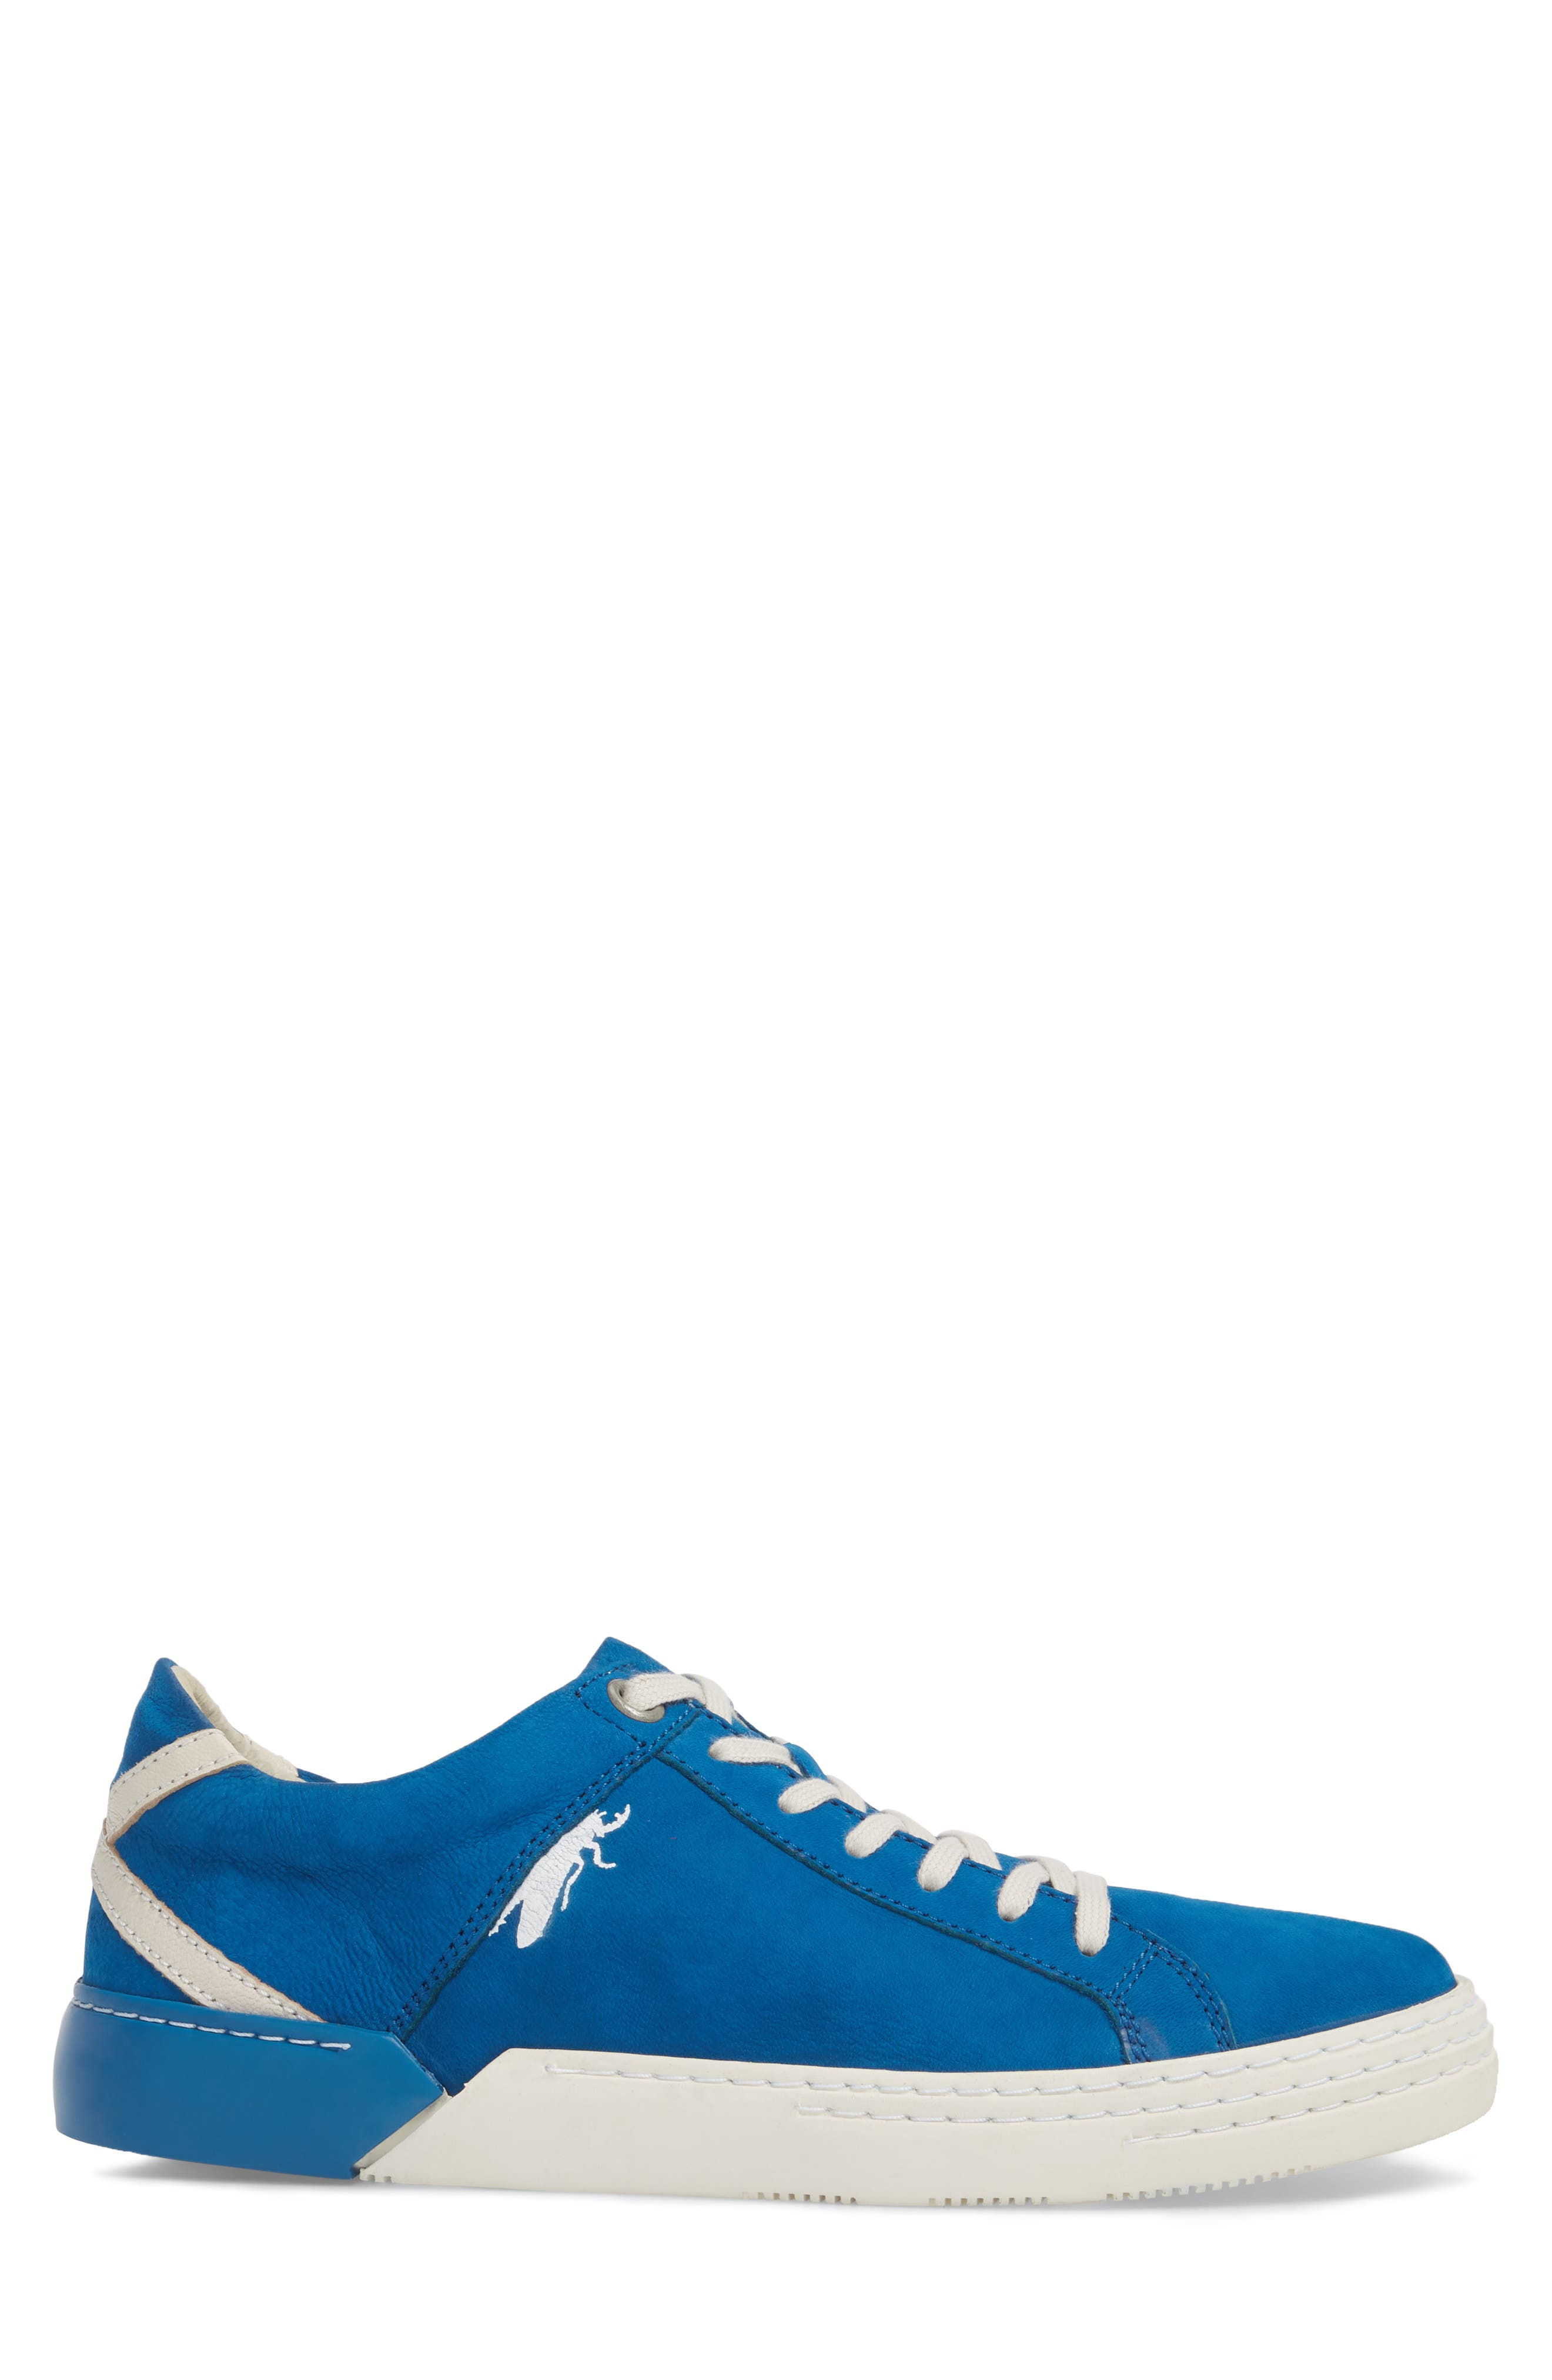 Sene Low Top Sneaker,                             Alternate thumbnail 3, color,                             ELECTRIC BLUE LEATHER